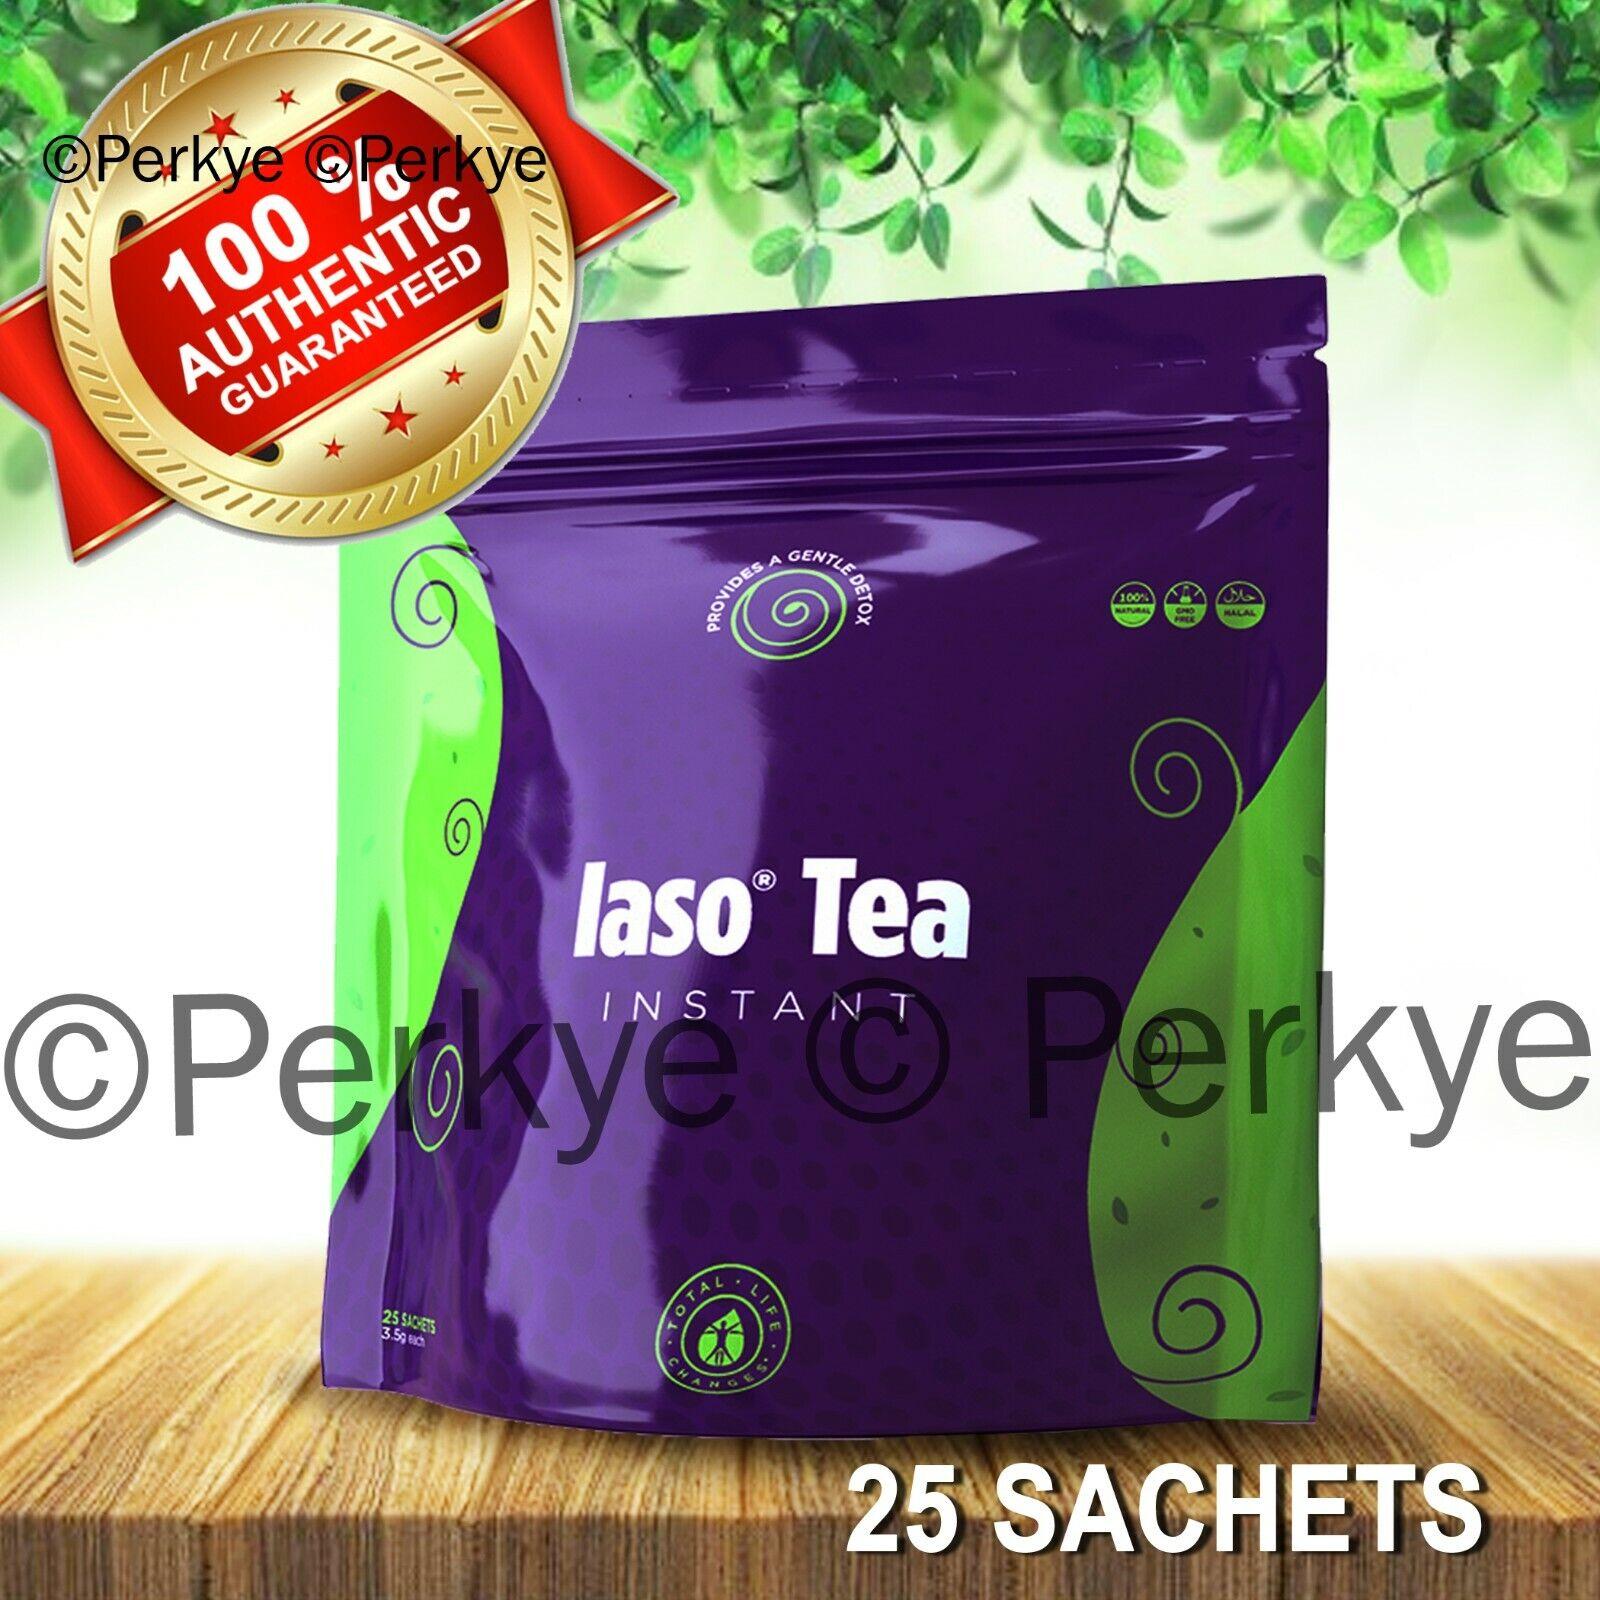 ❤️❤️ IASO INSTANT DETOX TEA 25 SACHETS_New in bag_ T